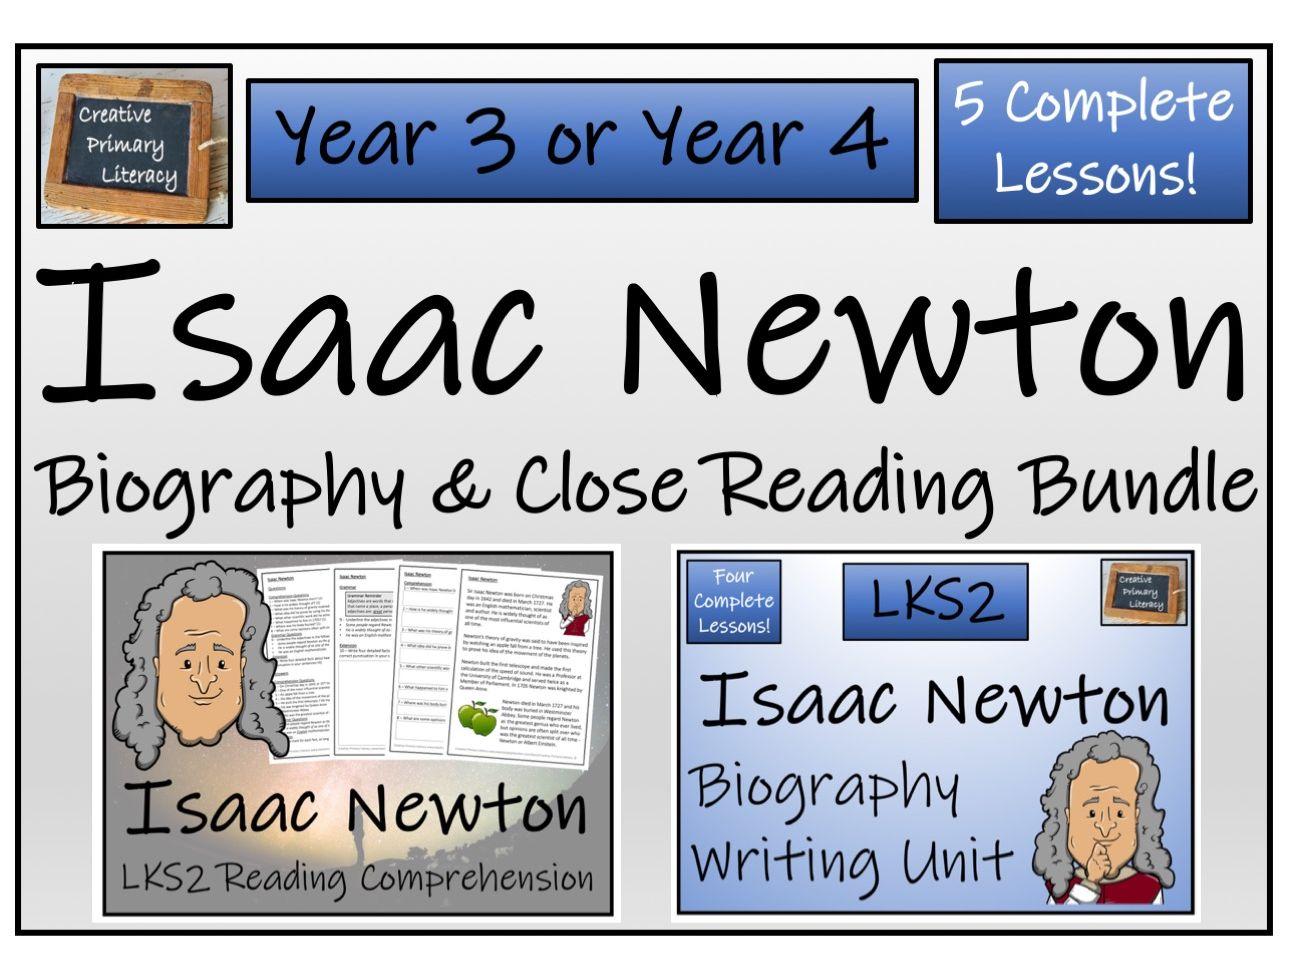 LKS2 Science - Isaac Newton Reading Comprehension & Biography Writing Bundle